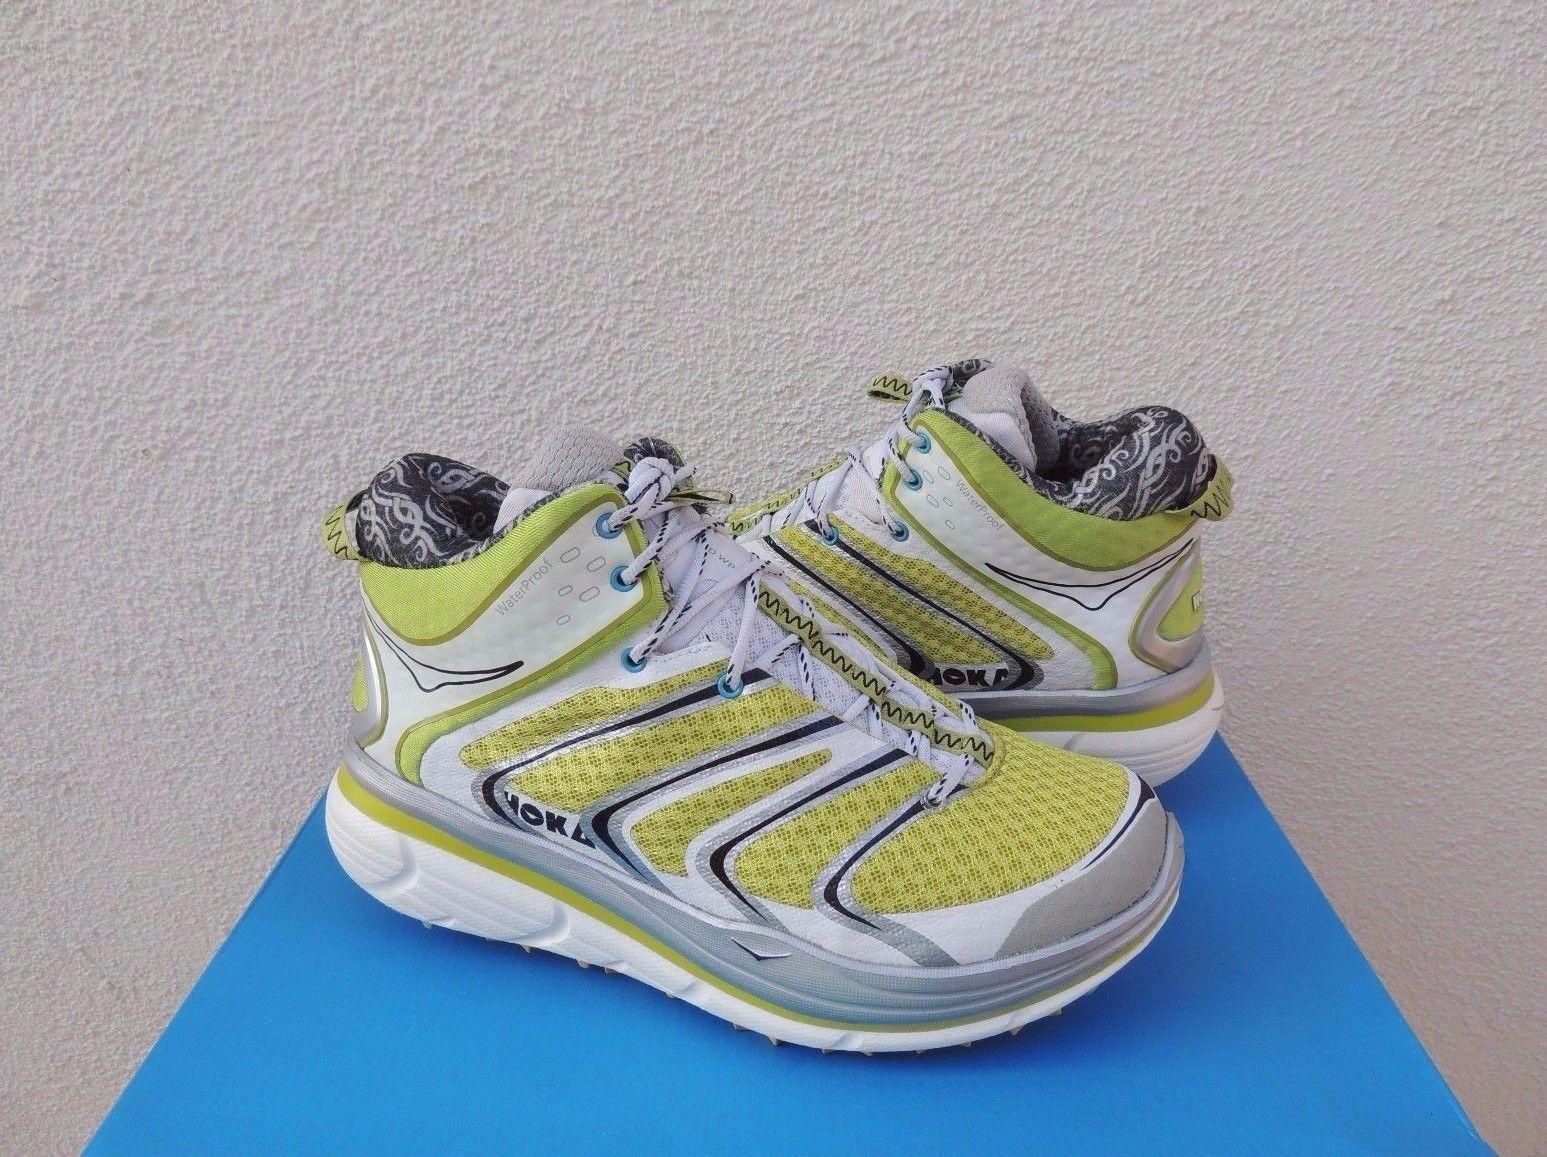 HOKA ONE ONE TOR SPEED MID WATERPROOF HIKING Stiefel EUR Schuhe, WOMEN US 7/ EUR Stiefel 38 2/3 8f68d6